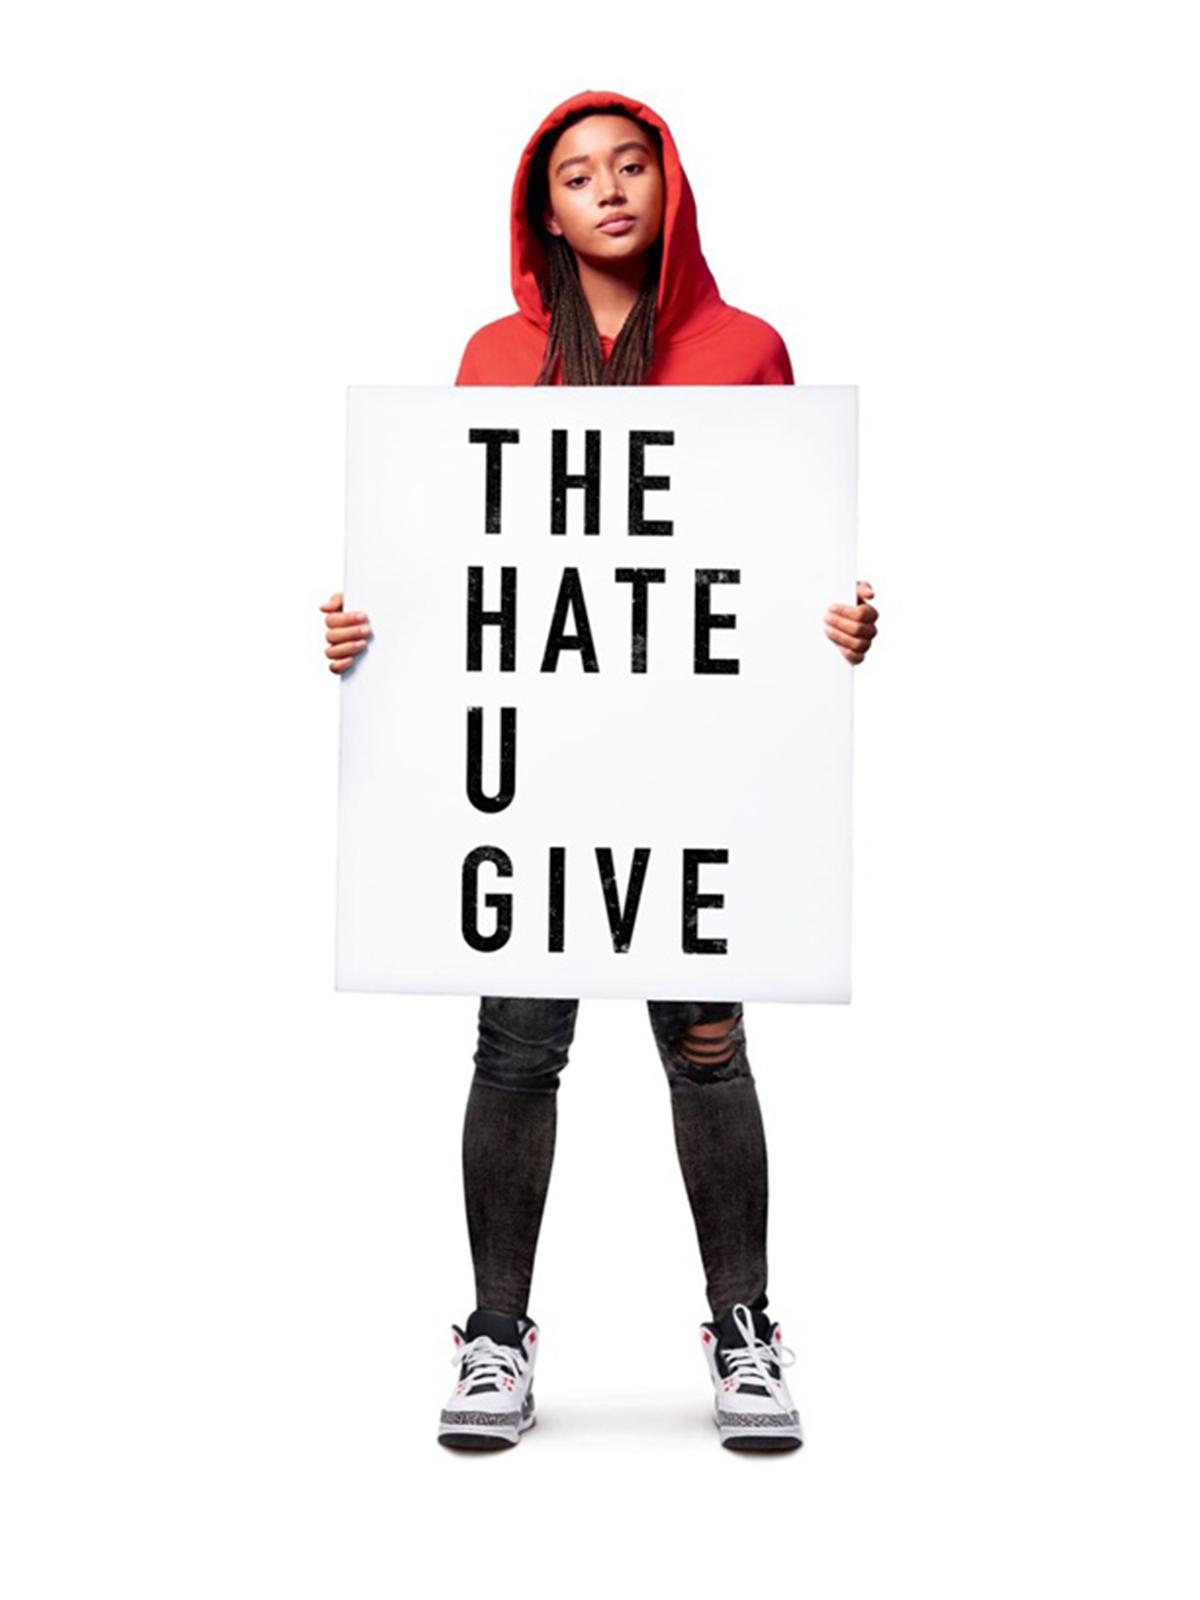 Video_The Hate u Give